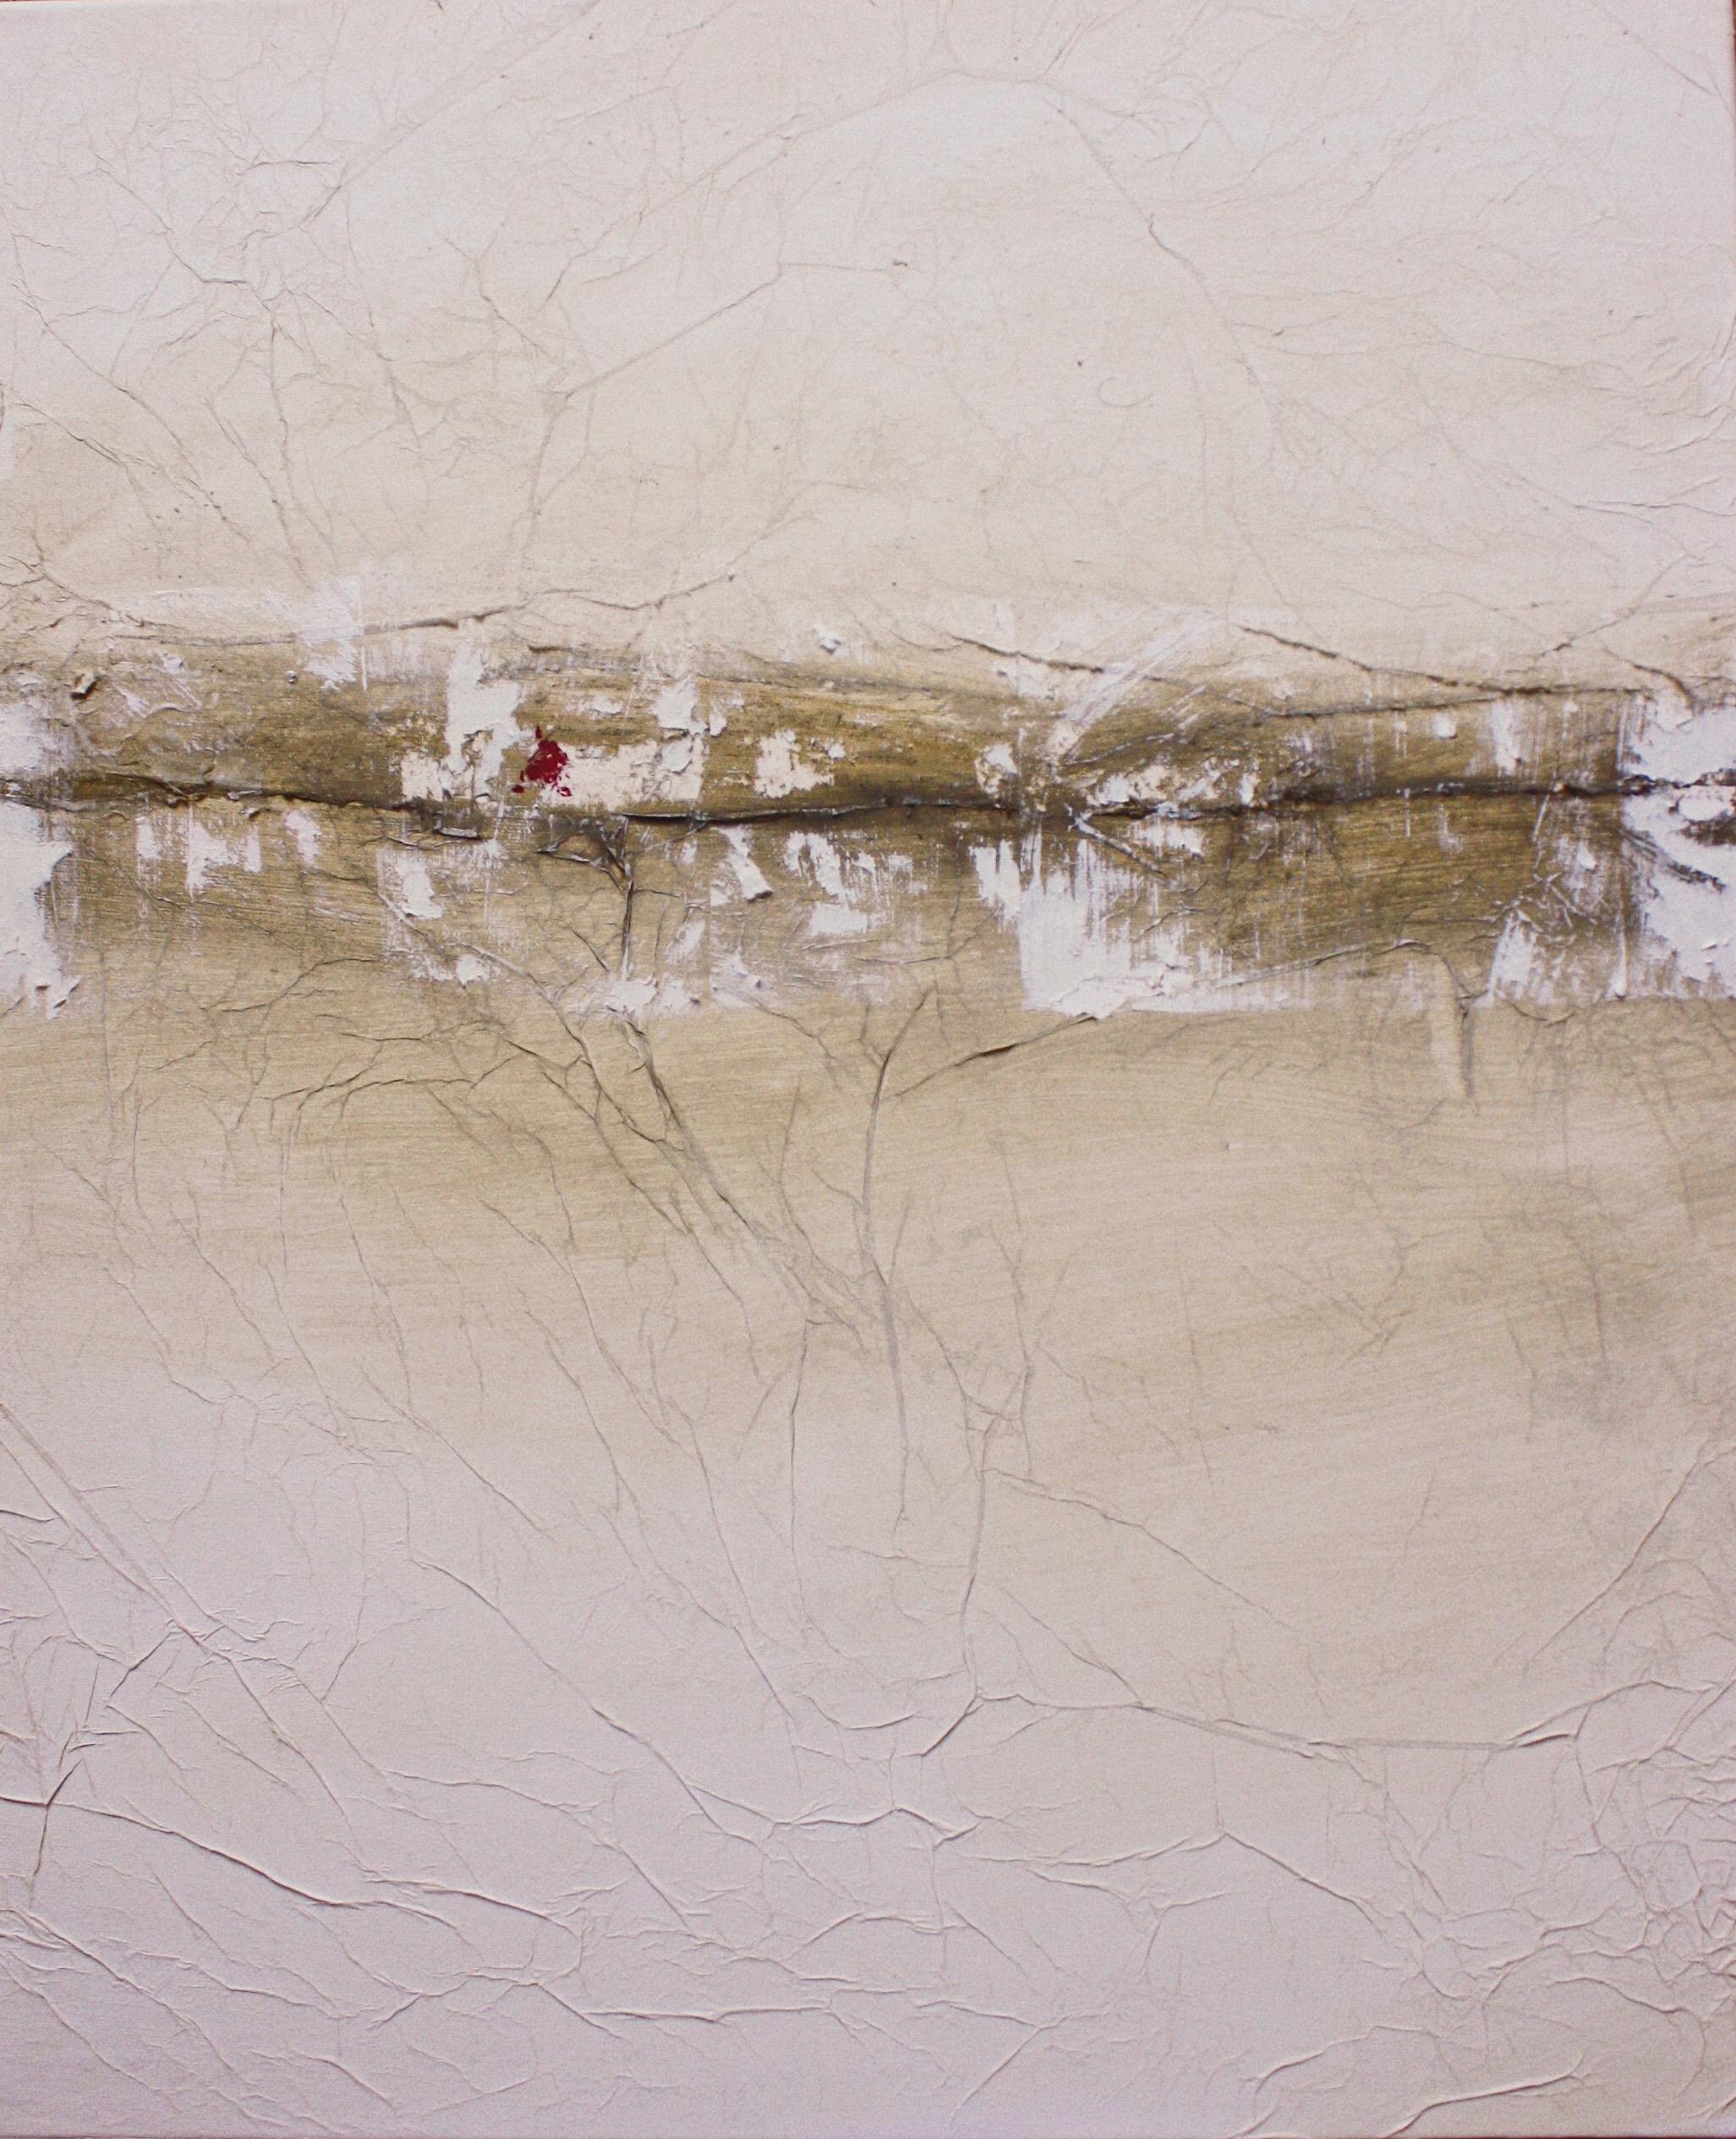 Marine Bonzom - Artiste Peintre Biarritz - Wherever I go, My Heart ..